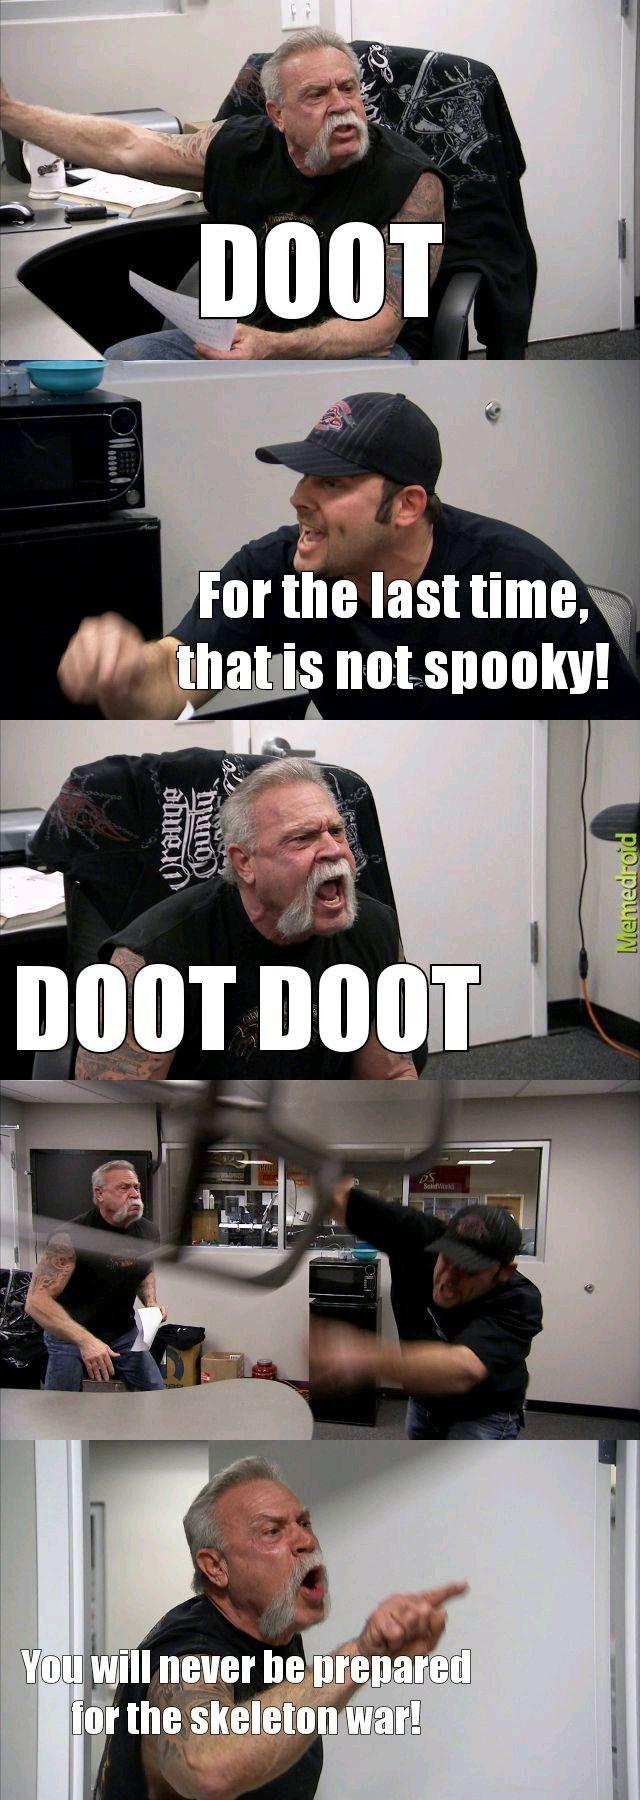 [Insert appropriate title here] - meme